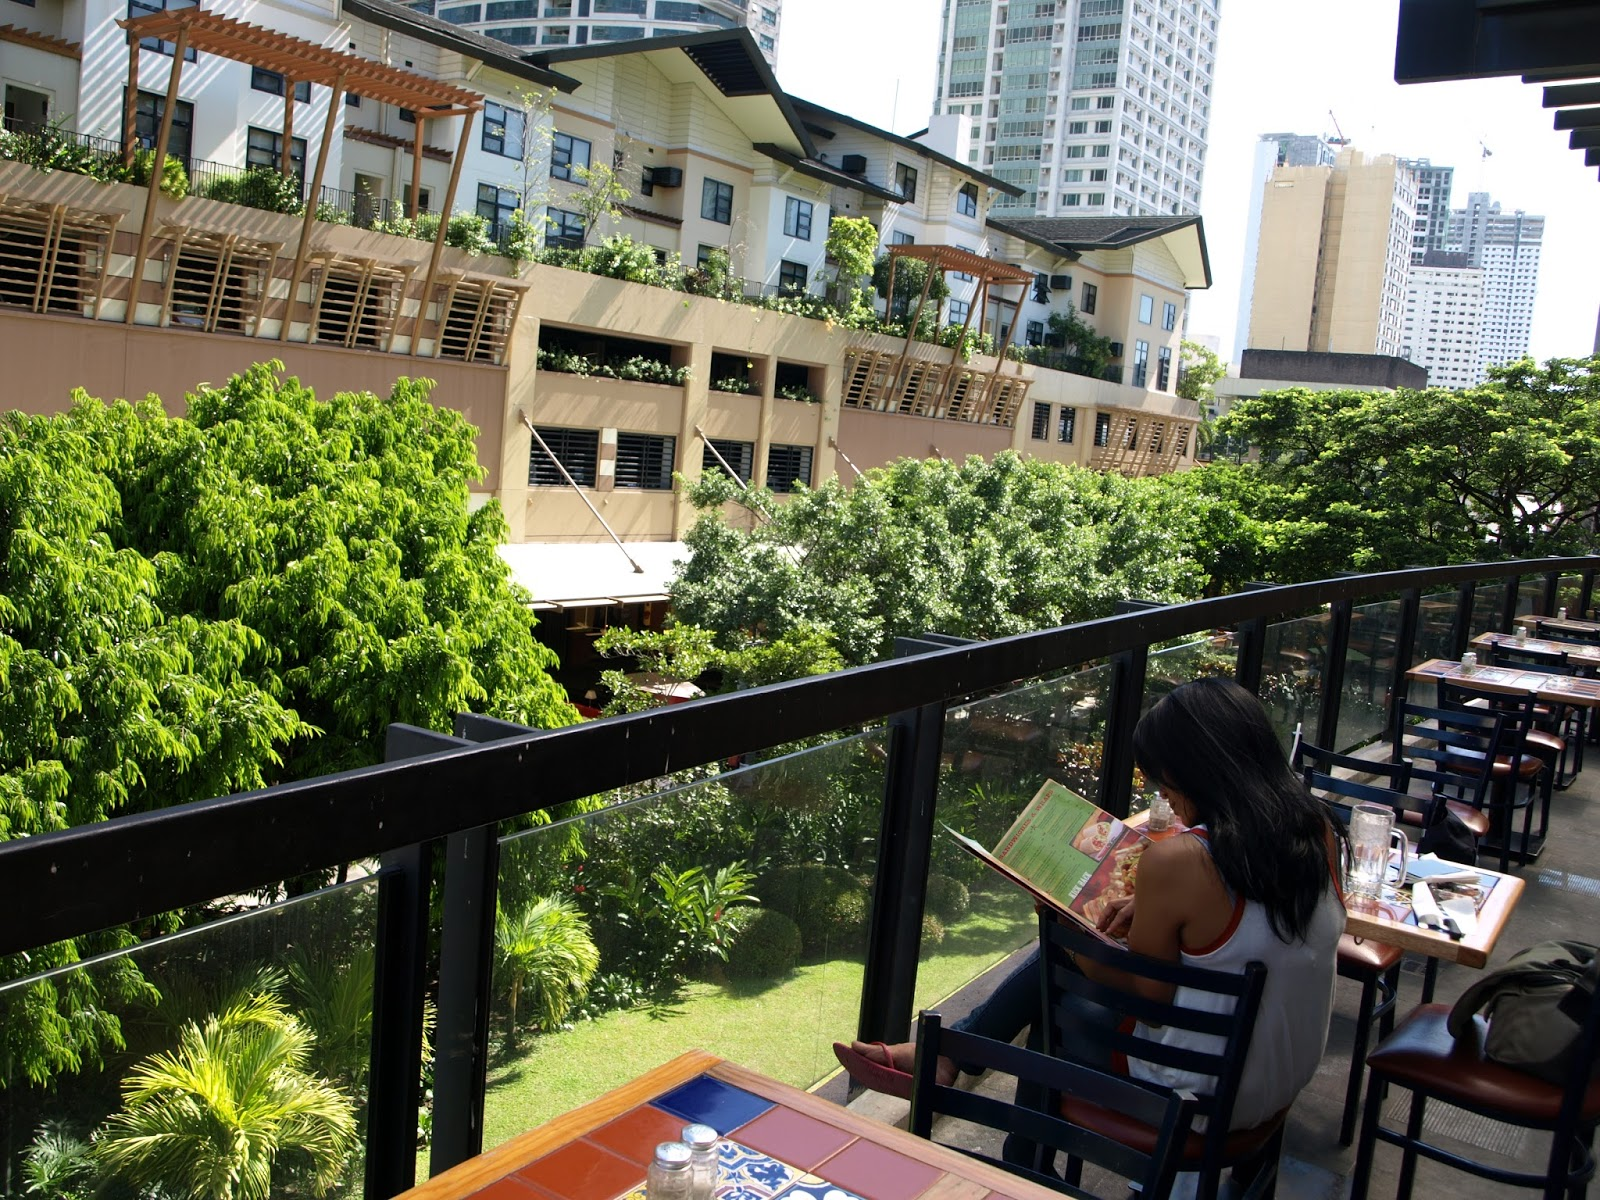 Restaurants Cater Green Bay